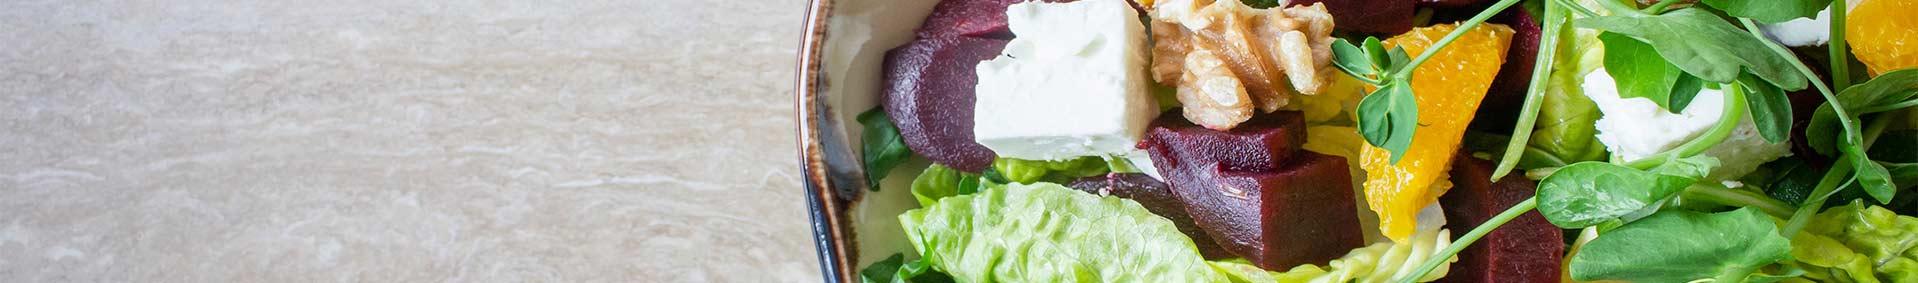 Gesunde Ernährung und Lebensführung: Salat